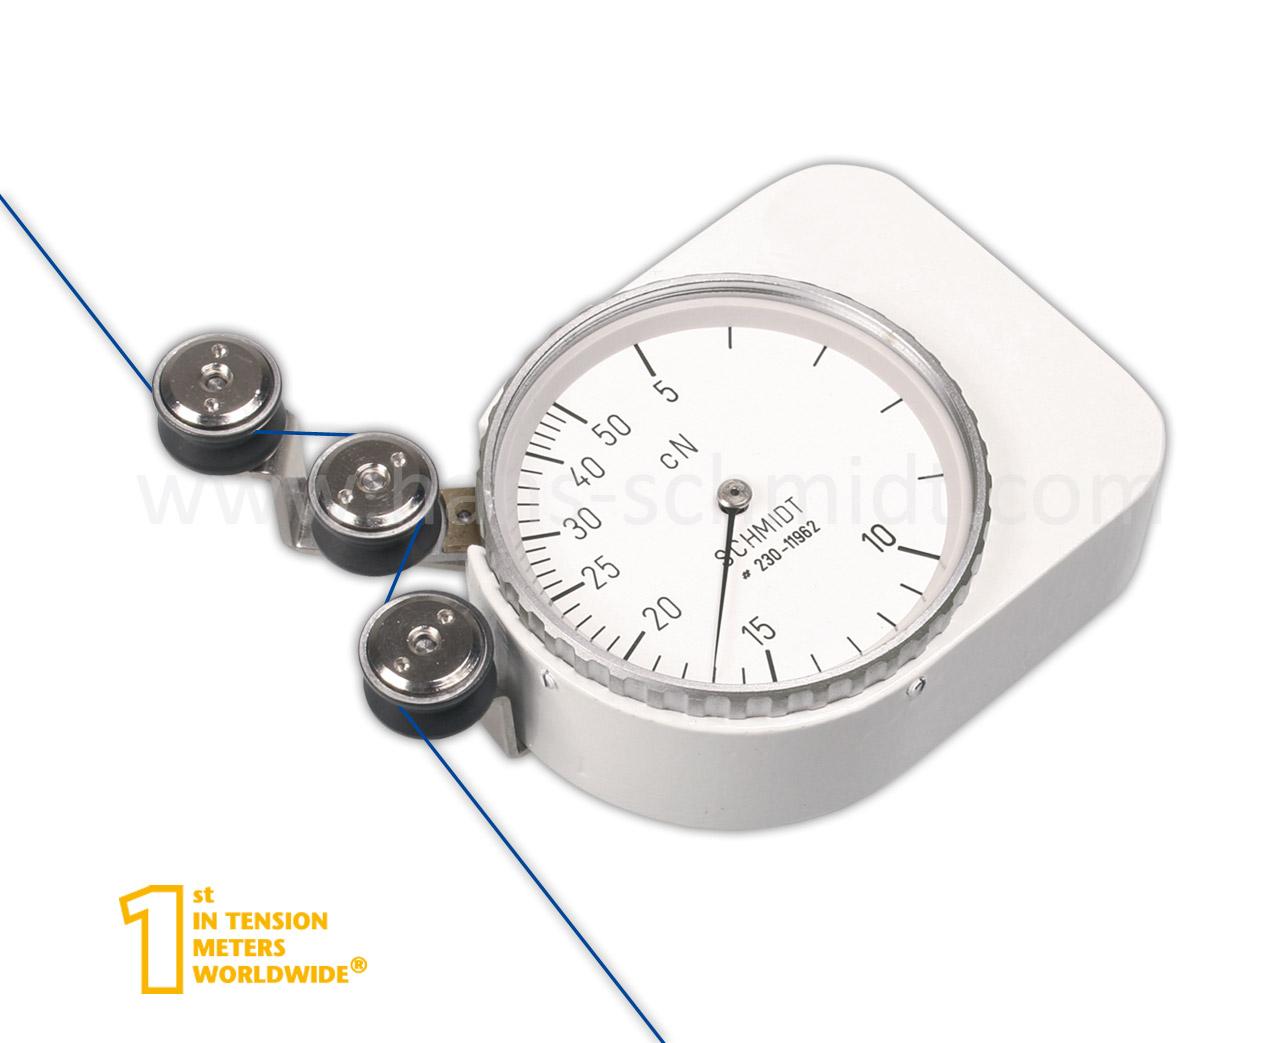 Tension Meter Q, stationary mechanical device - Hans Schmidt